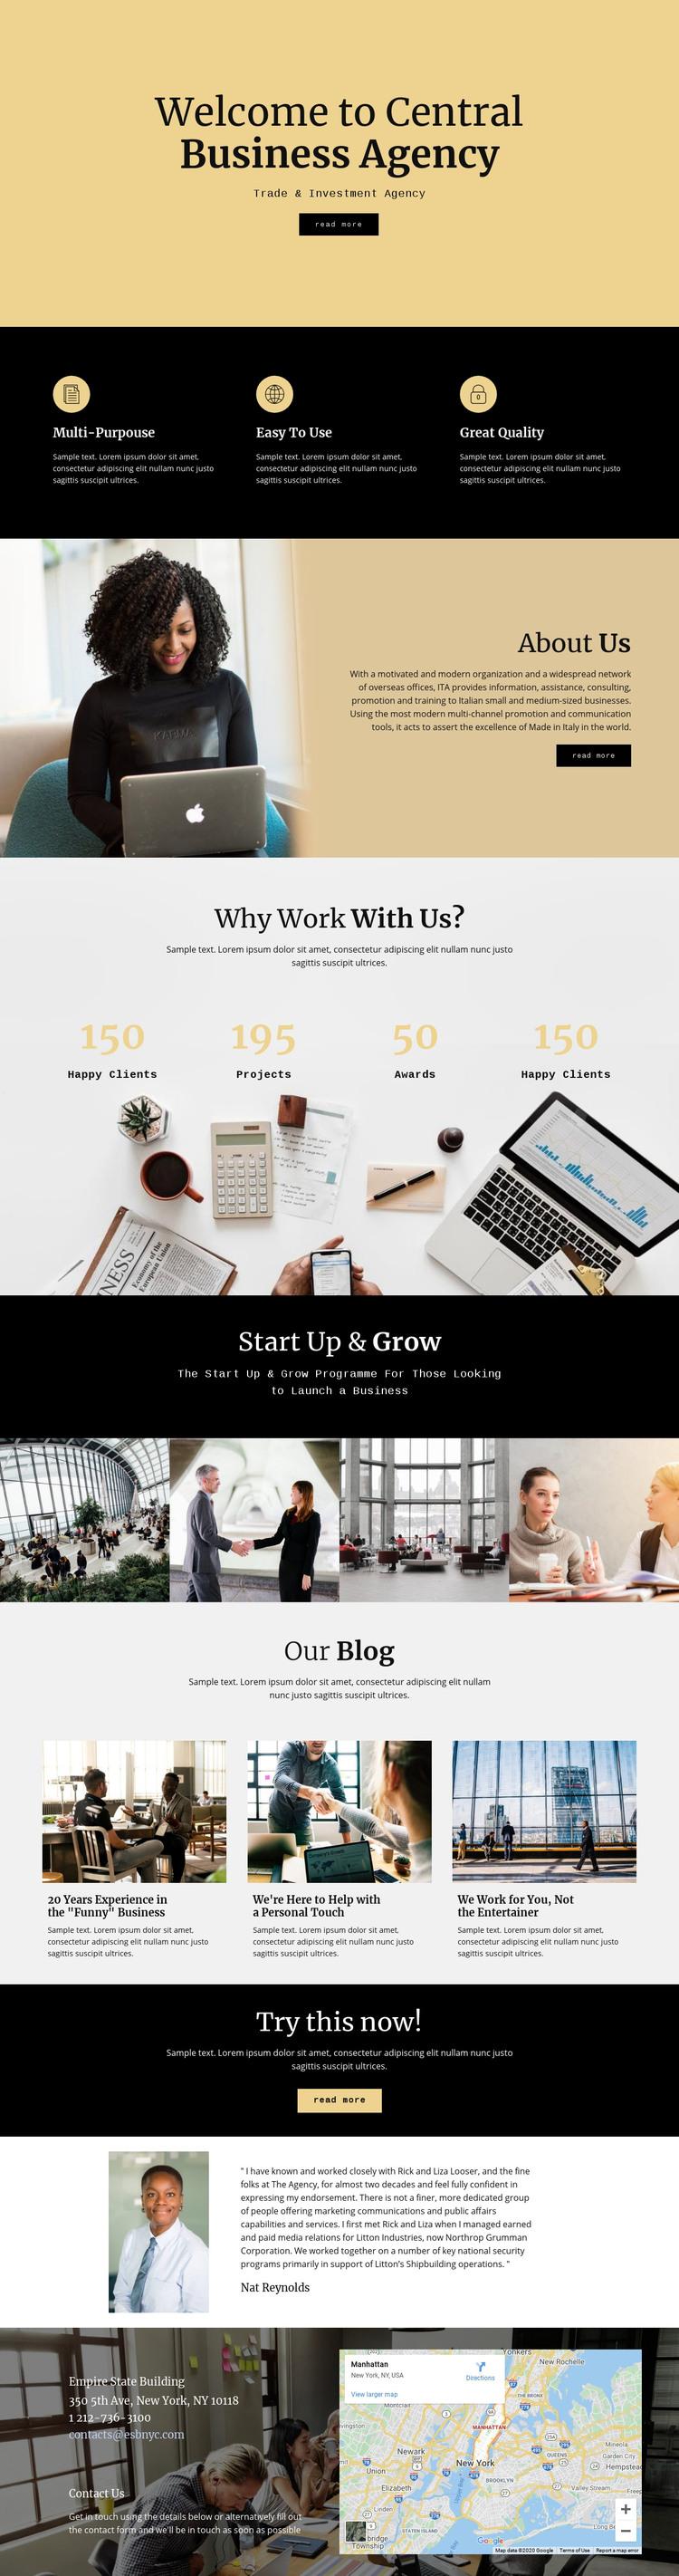 Central digital agency Homepage Design